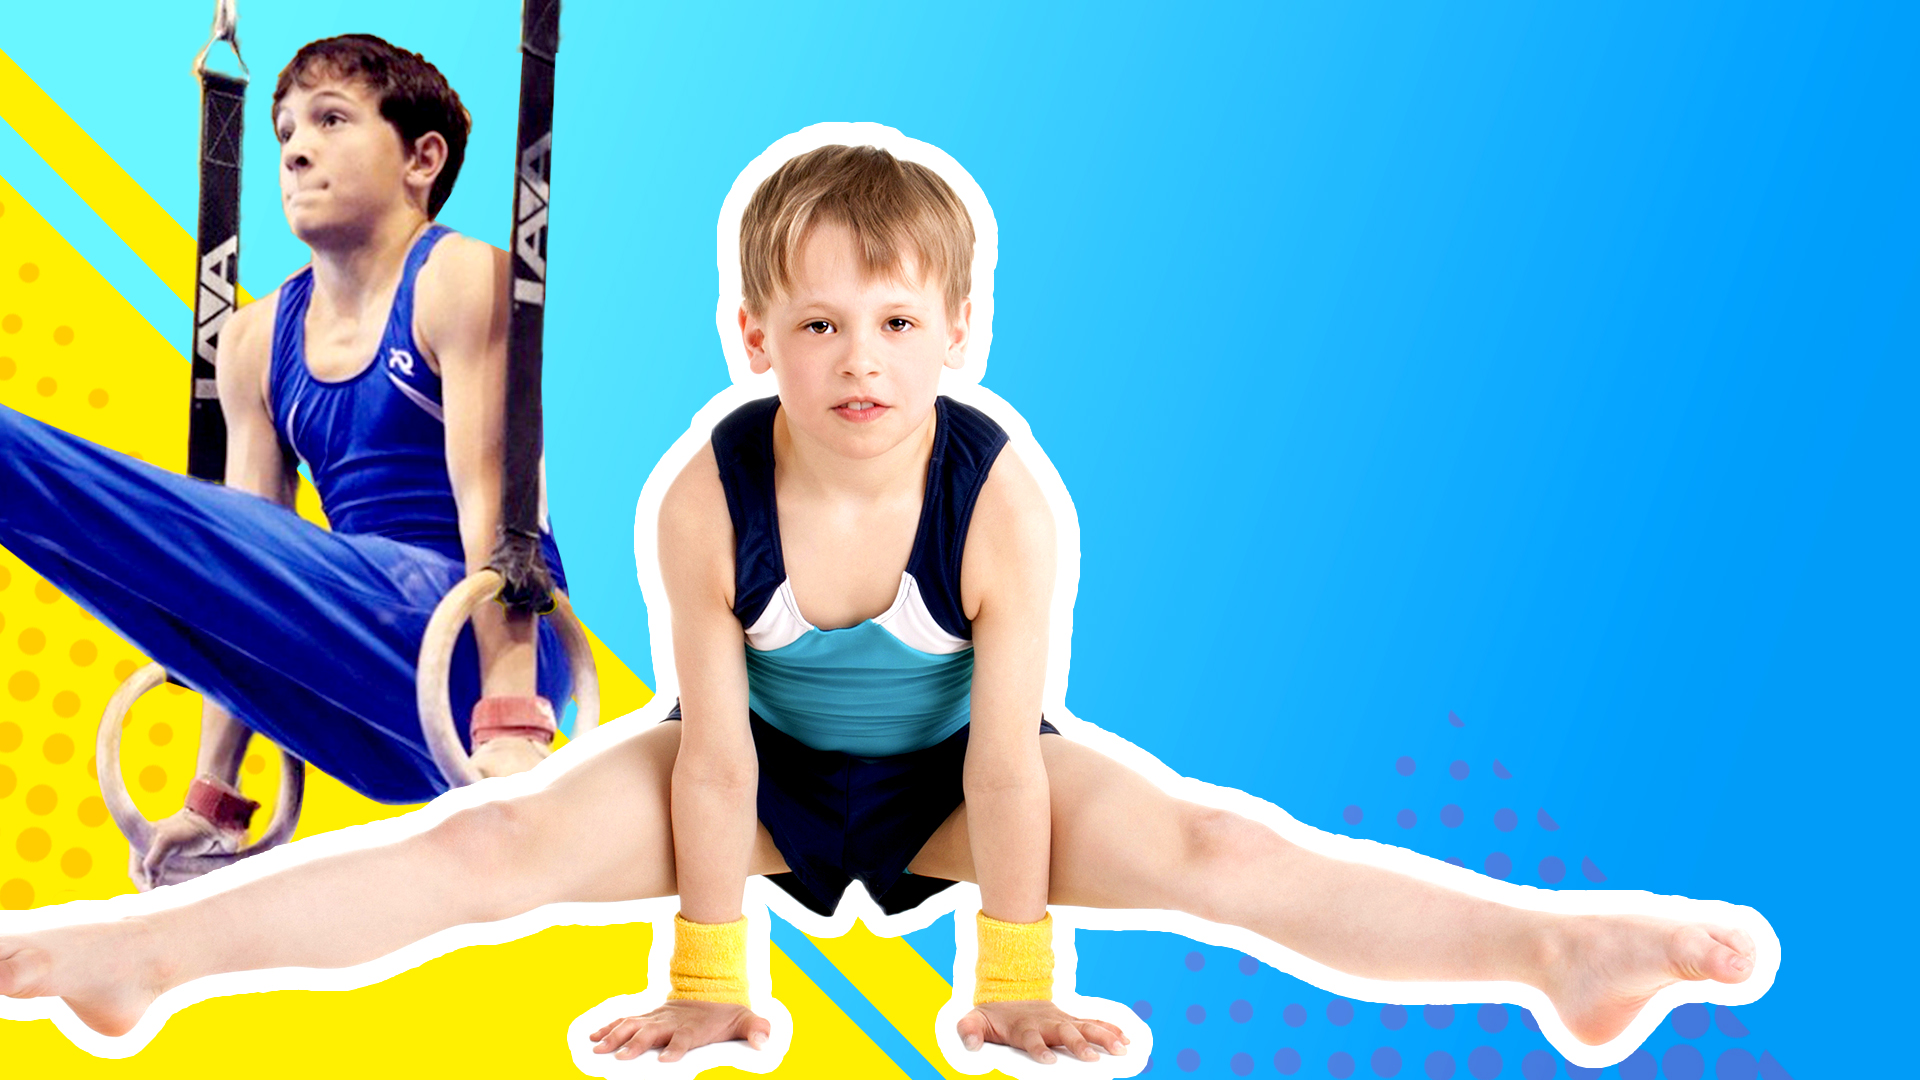 Hanna_Le - ASI Gymnastics Team Level 1 meet on January 12